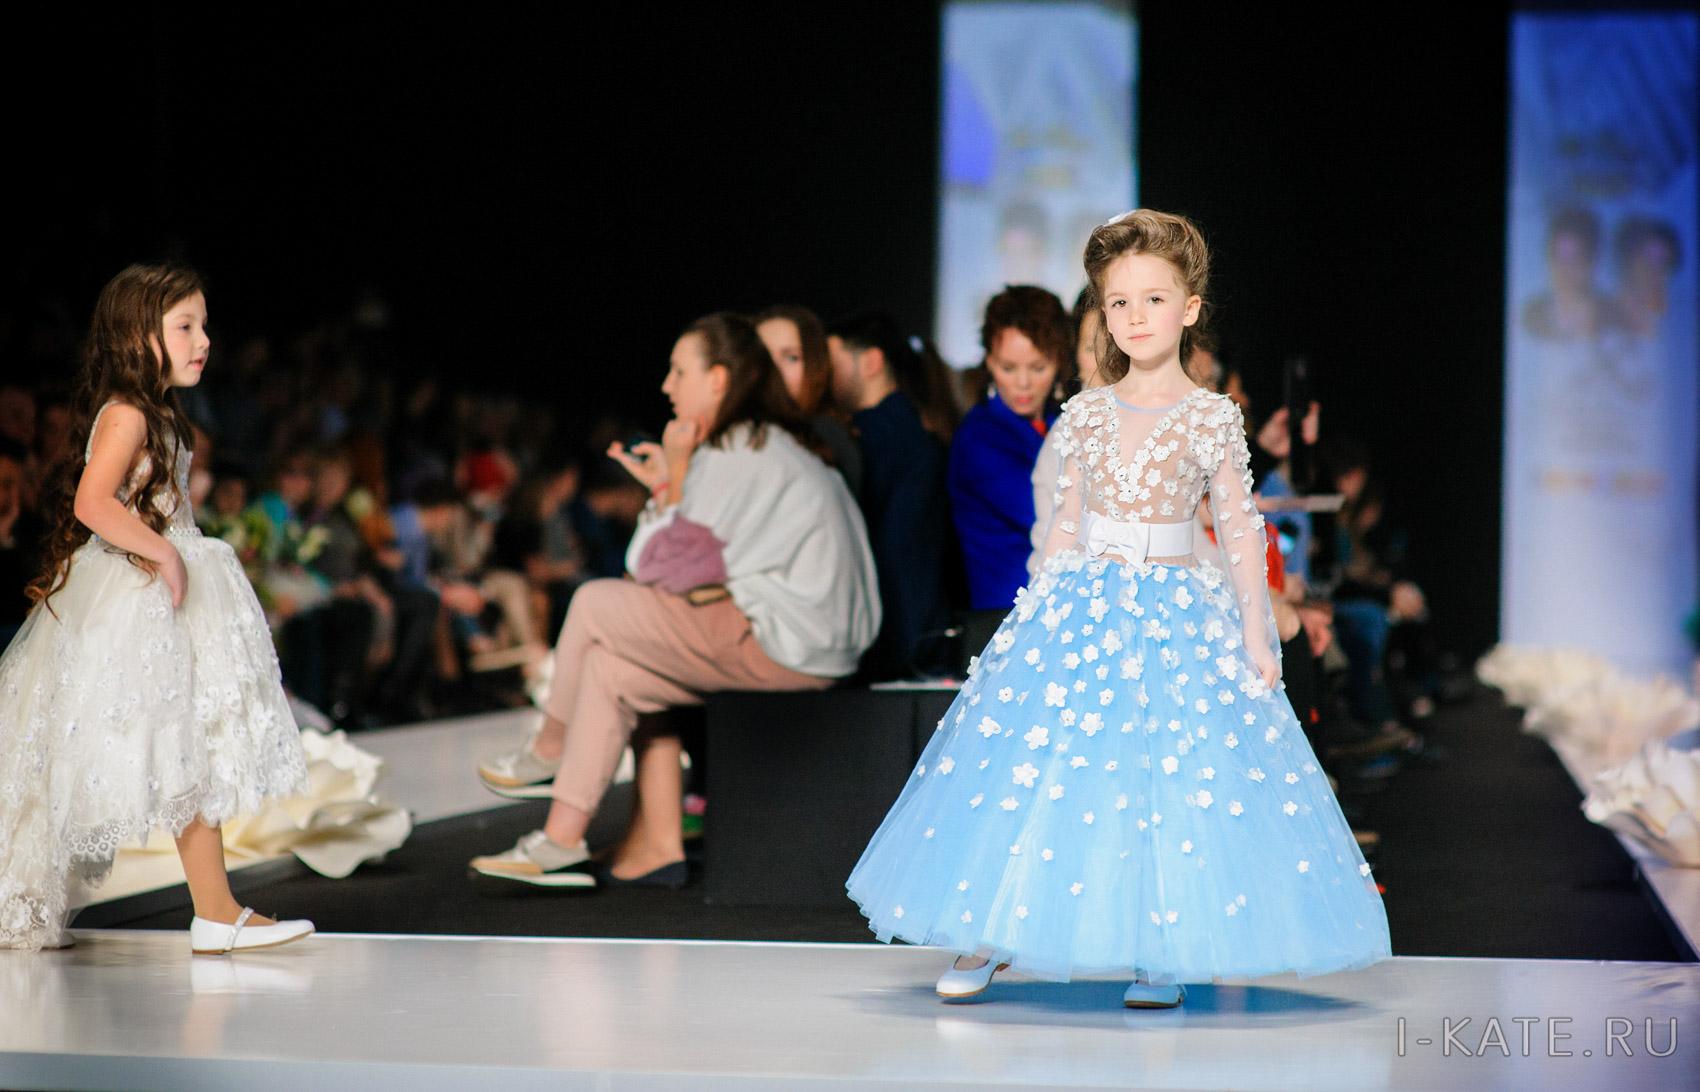 MBFWR 2017 ФЕСТИВАЛЬ ДЕТСКОЙ МОДЫ / KIDS FASHION FESTIVAL. Подиум. Платье от KIBOVSKAYA&PABLOSKY.